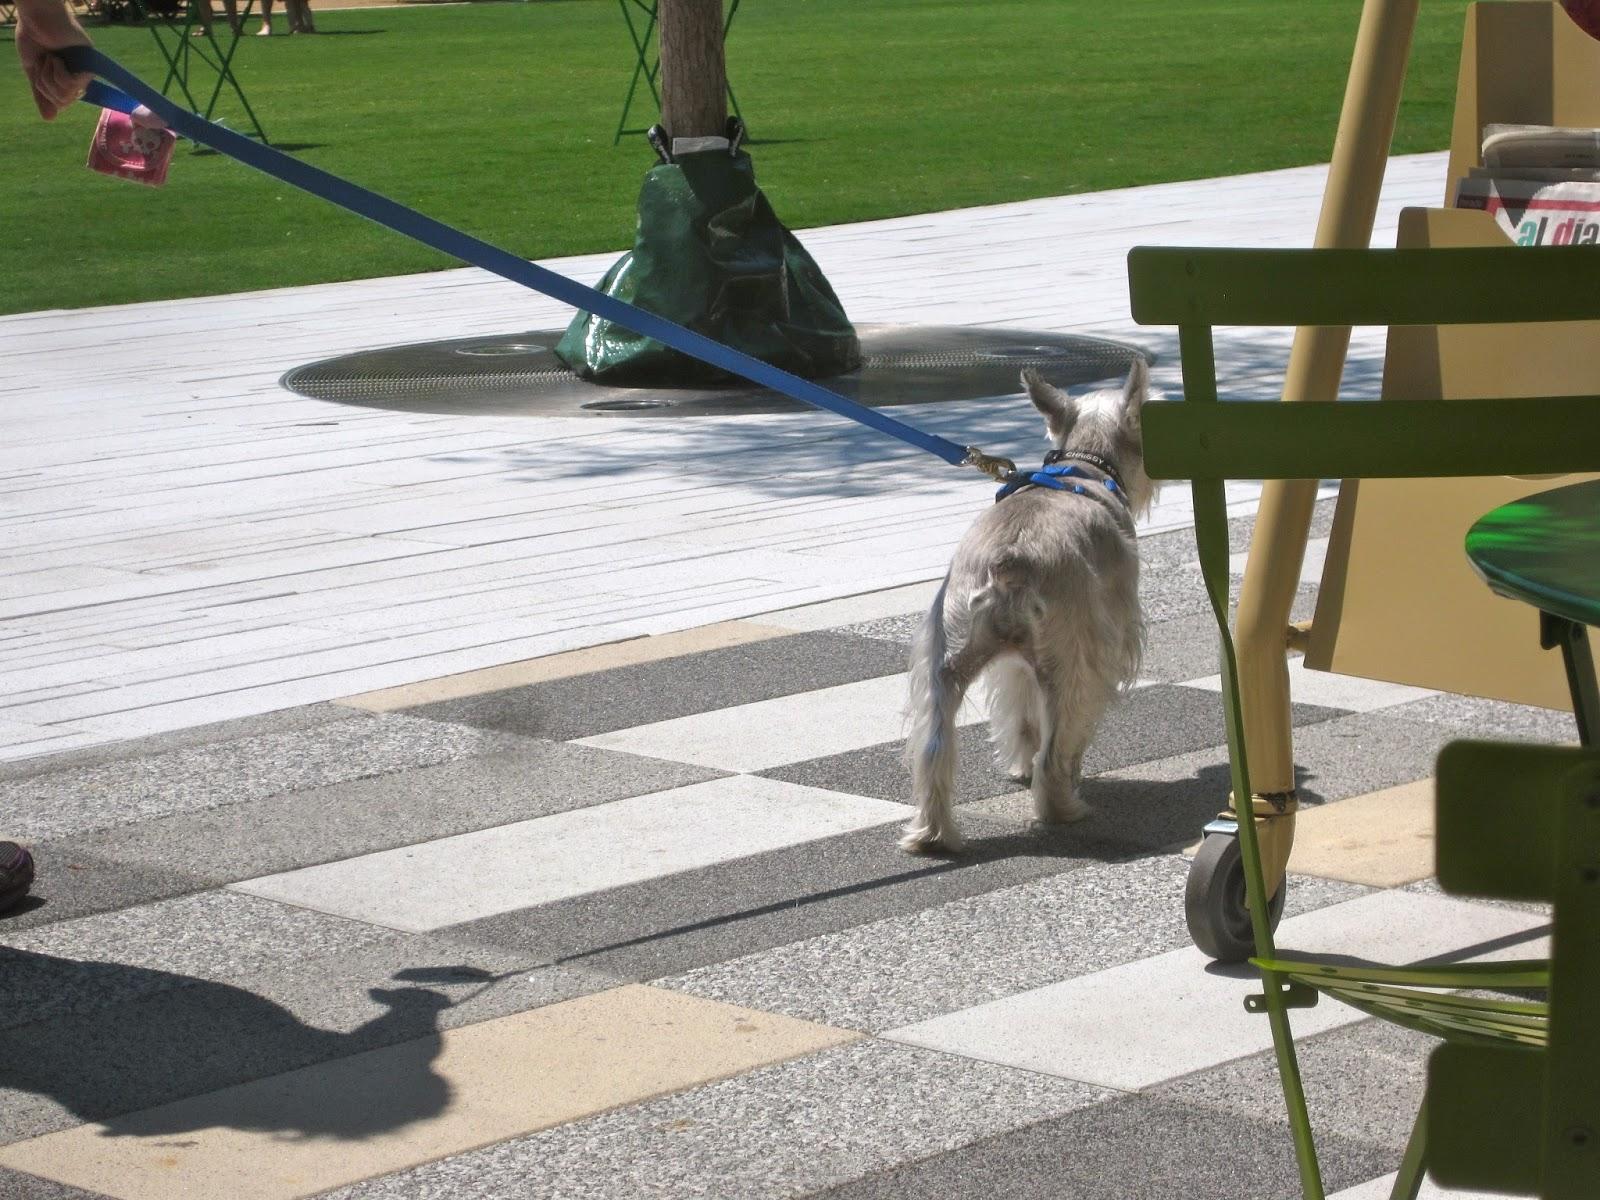 Giant Schnauzer Mastiff Mix This miniature schnauzer